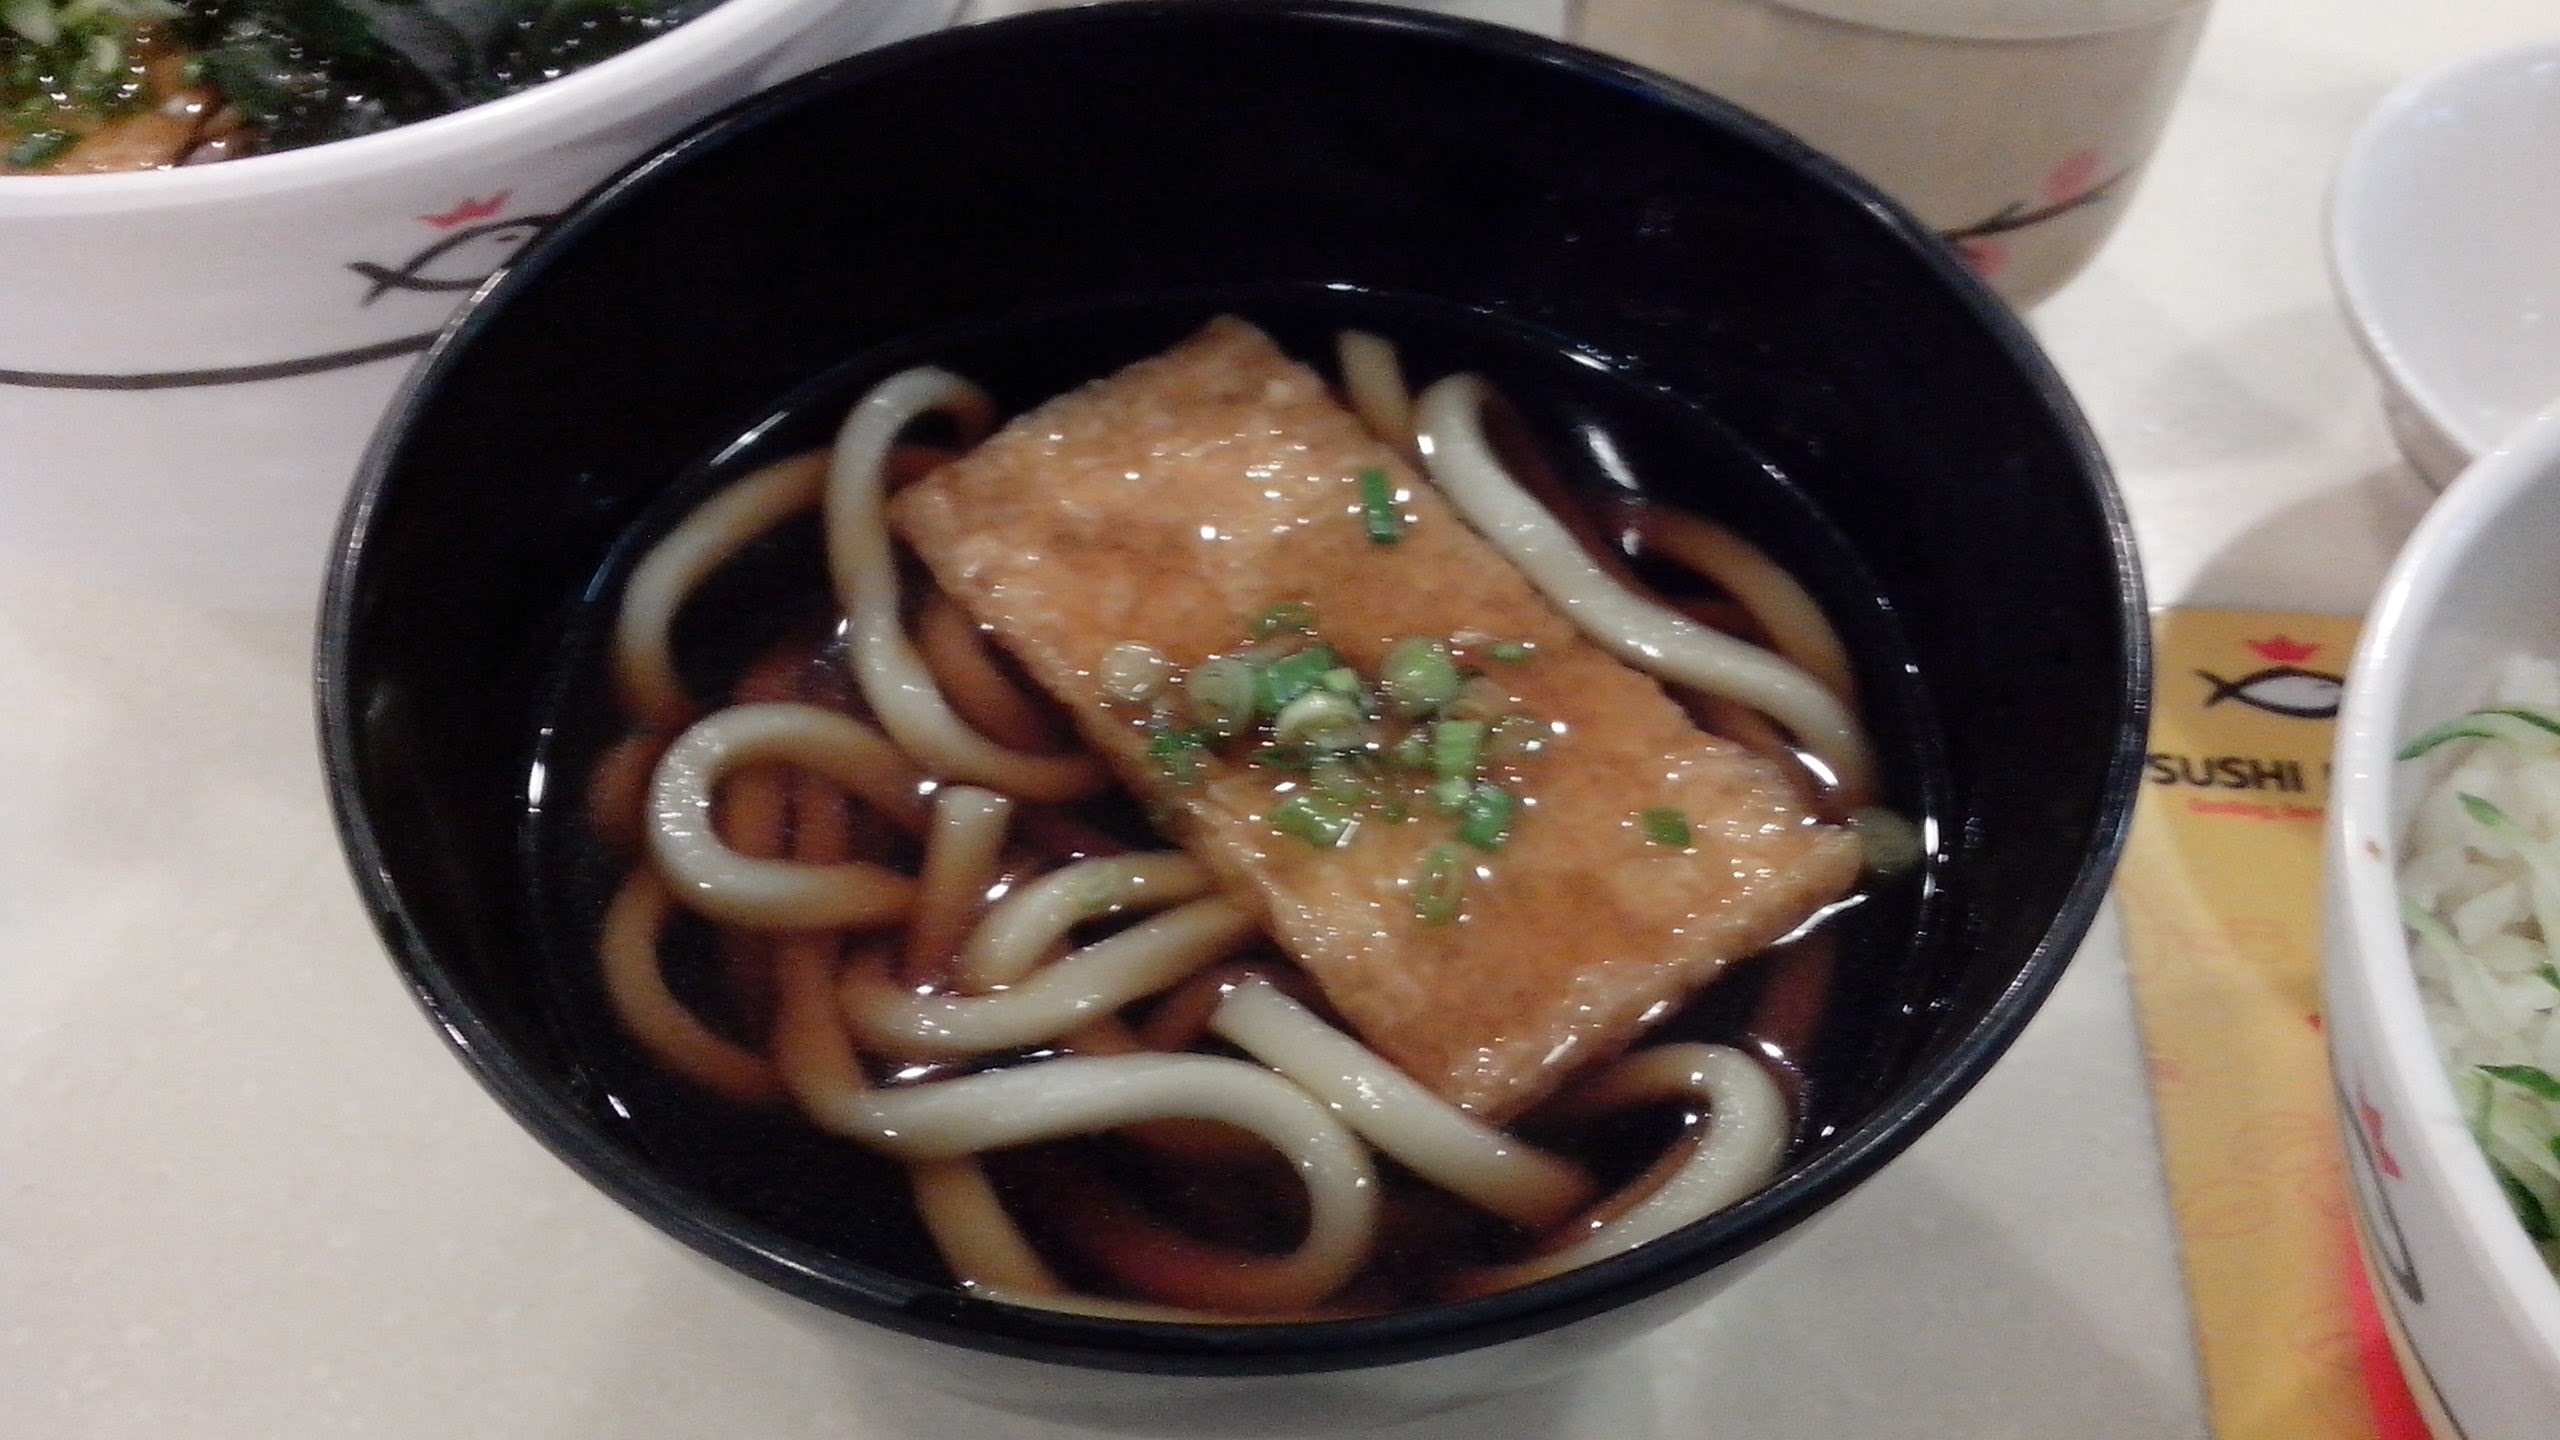 Resepi Mee Udon Sushi King